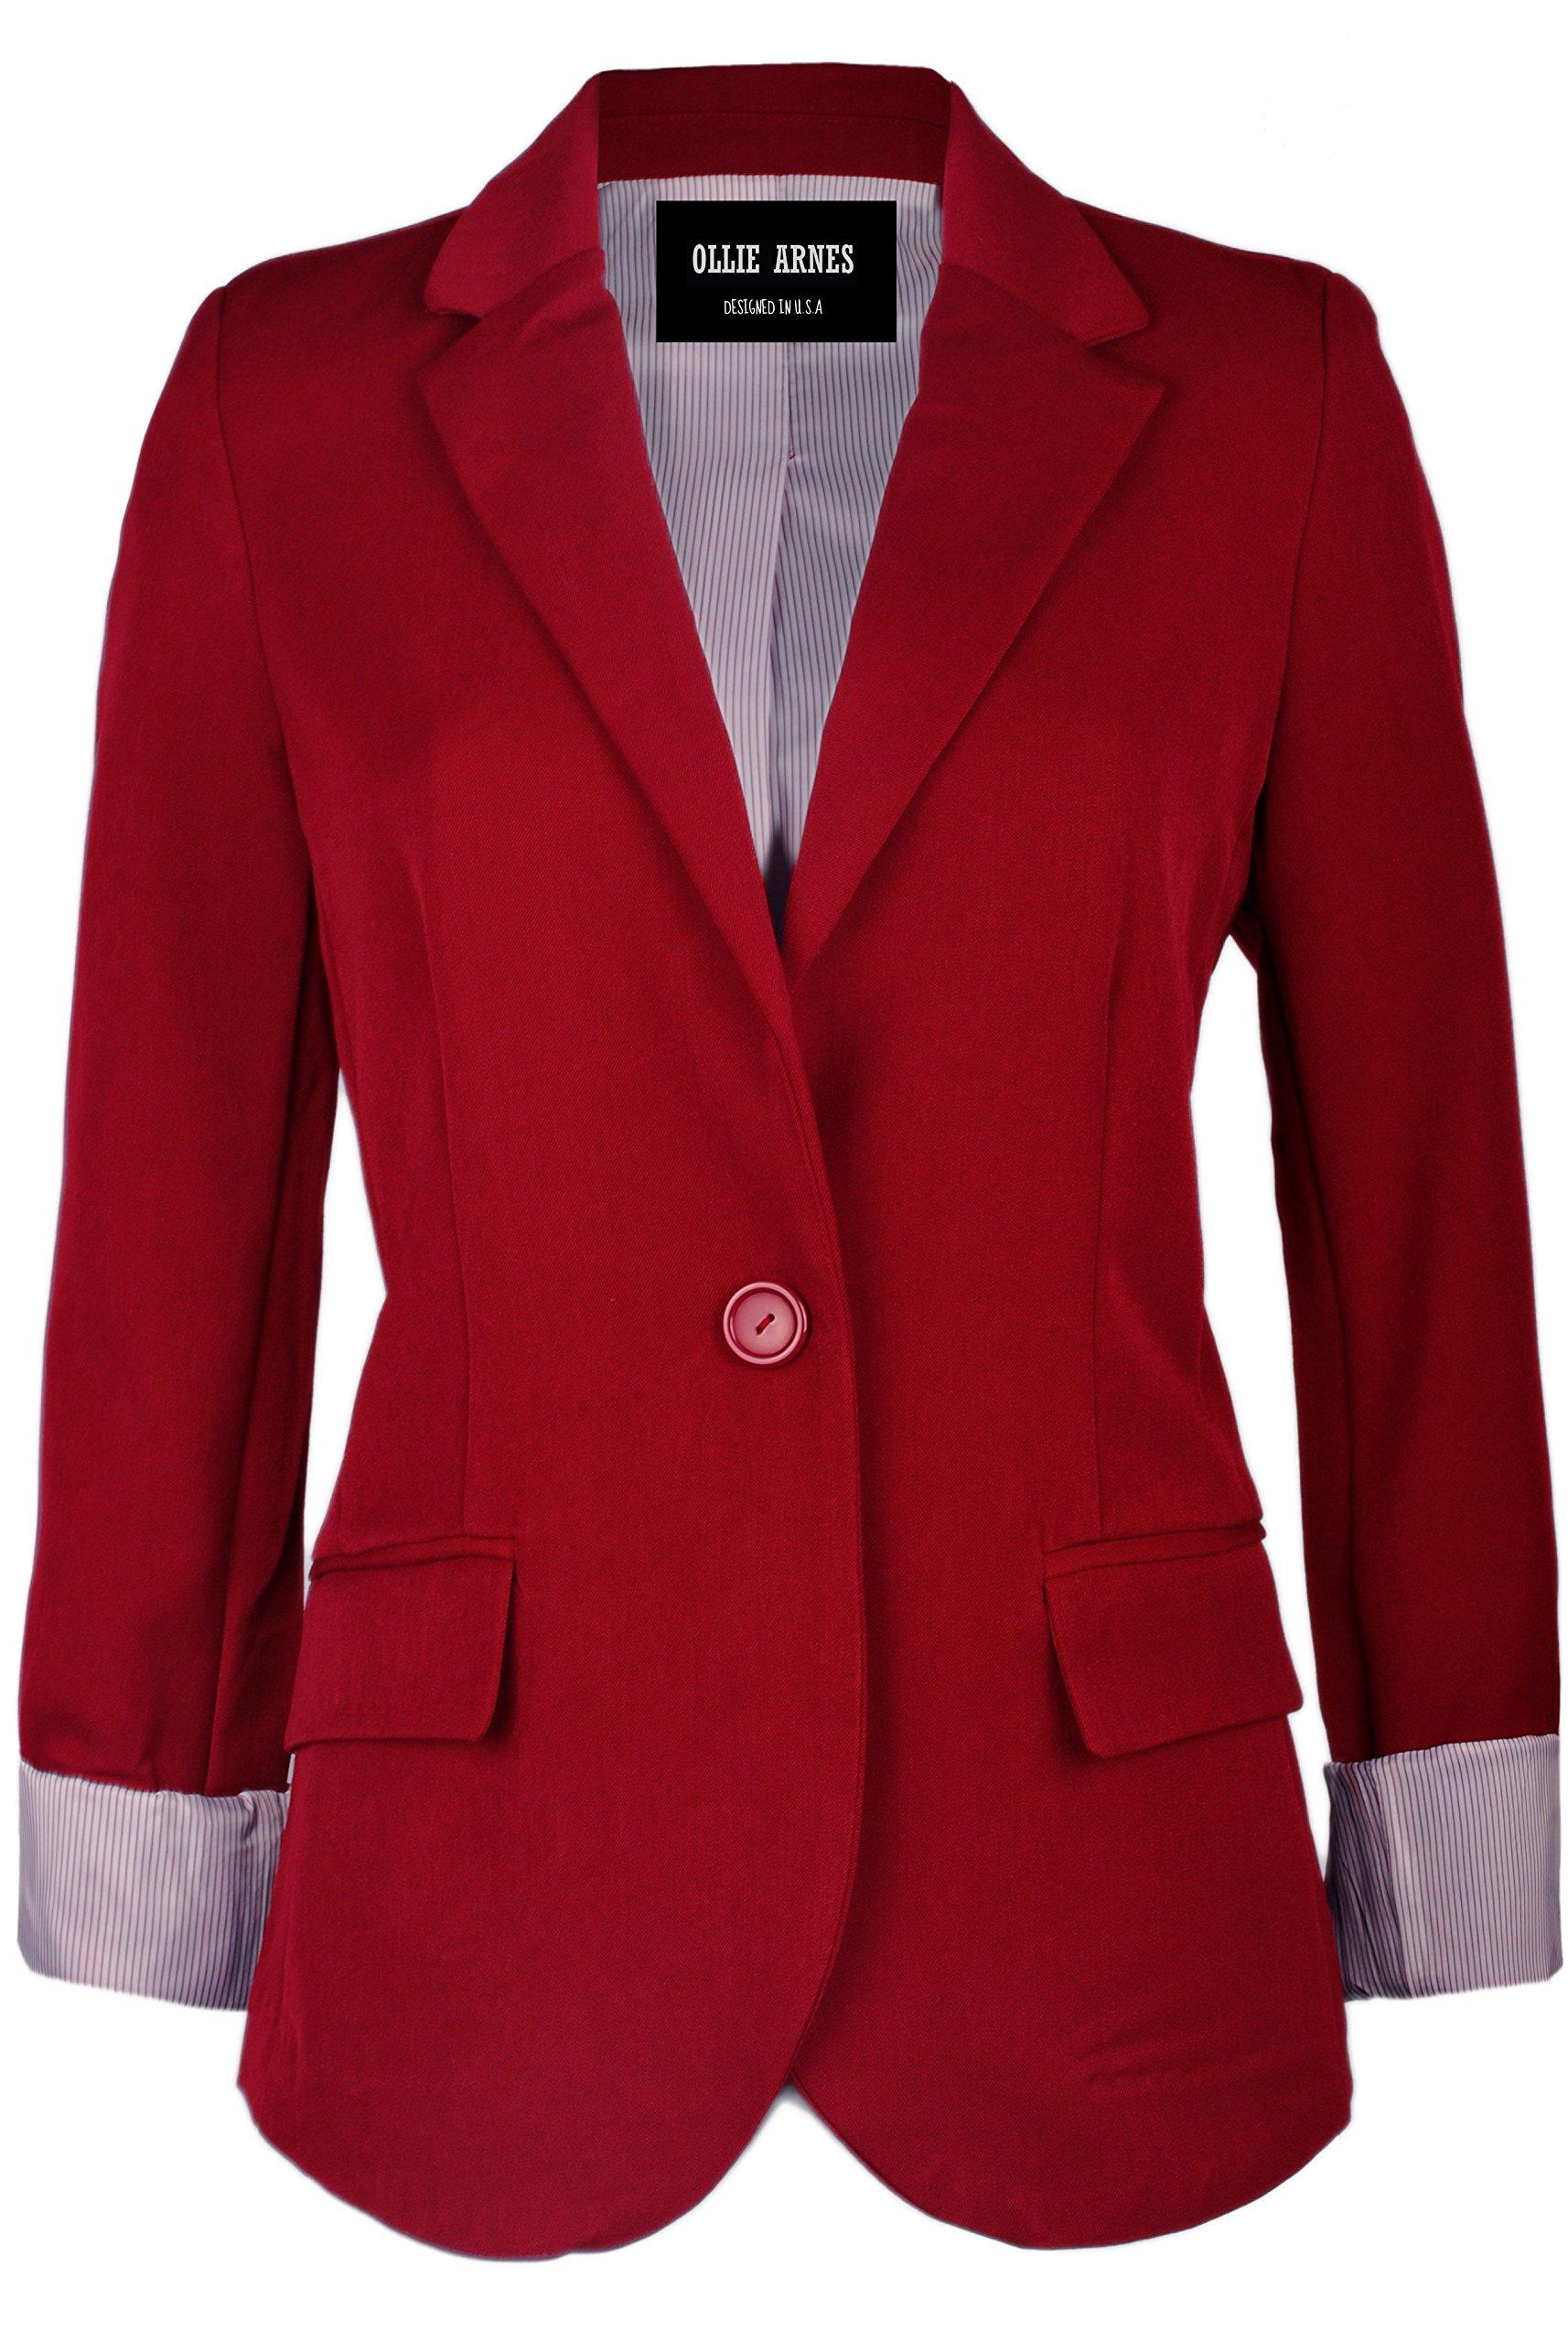 Ollie Arnes Women's Chic Trendy Professional Attire Long Sleeve Blazer Jacket 51_Red XL